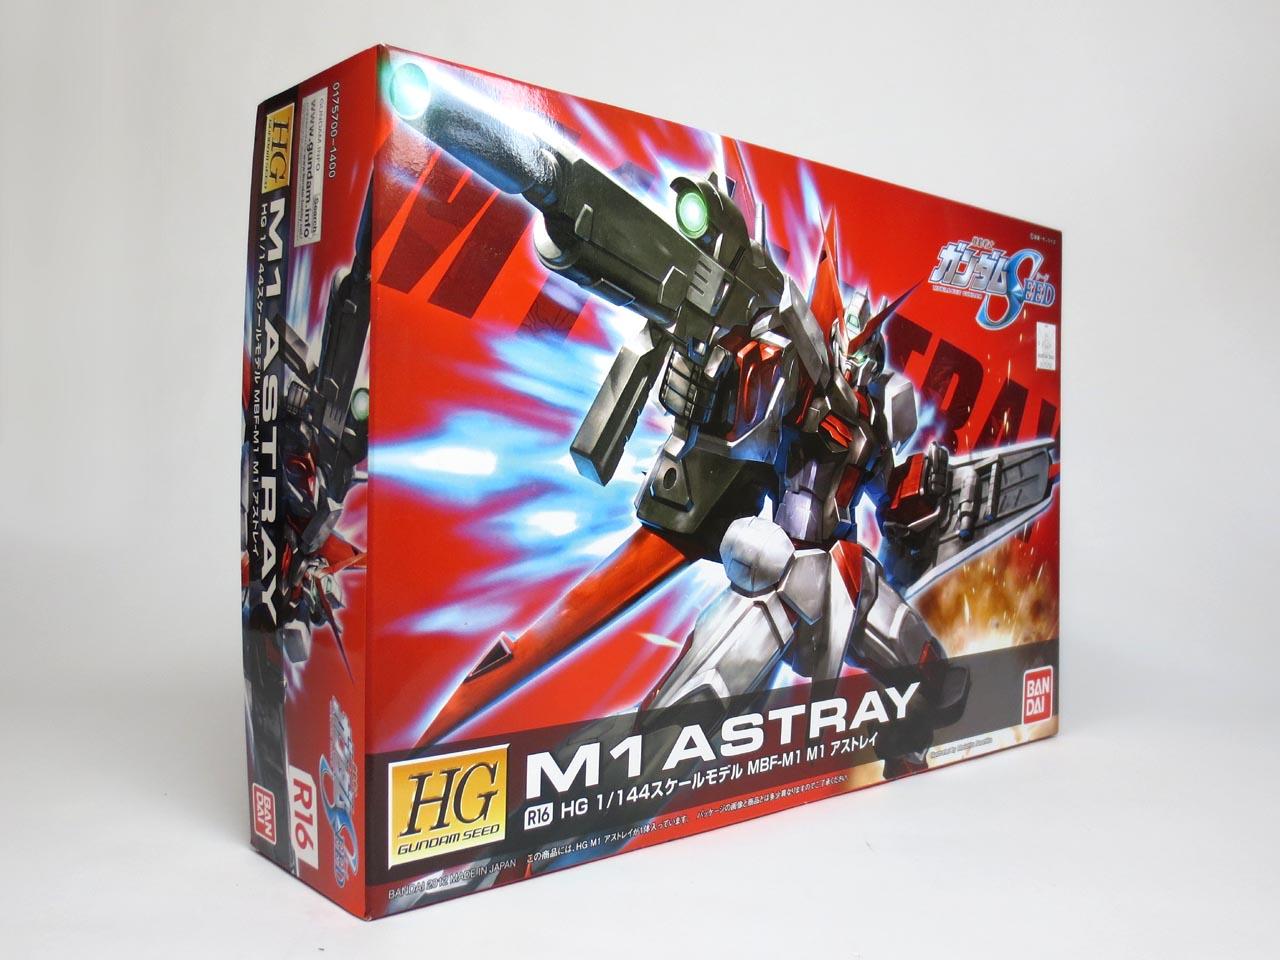 HG_MBF_M1_R16_M1_Astray_01.jpg